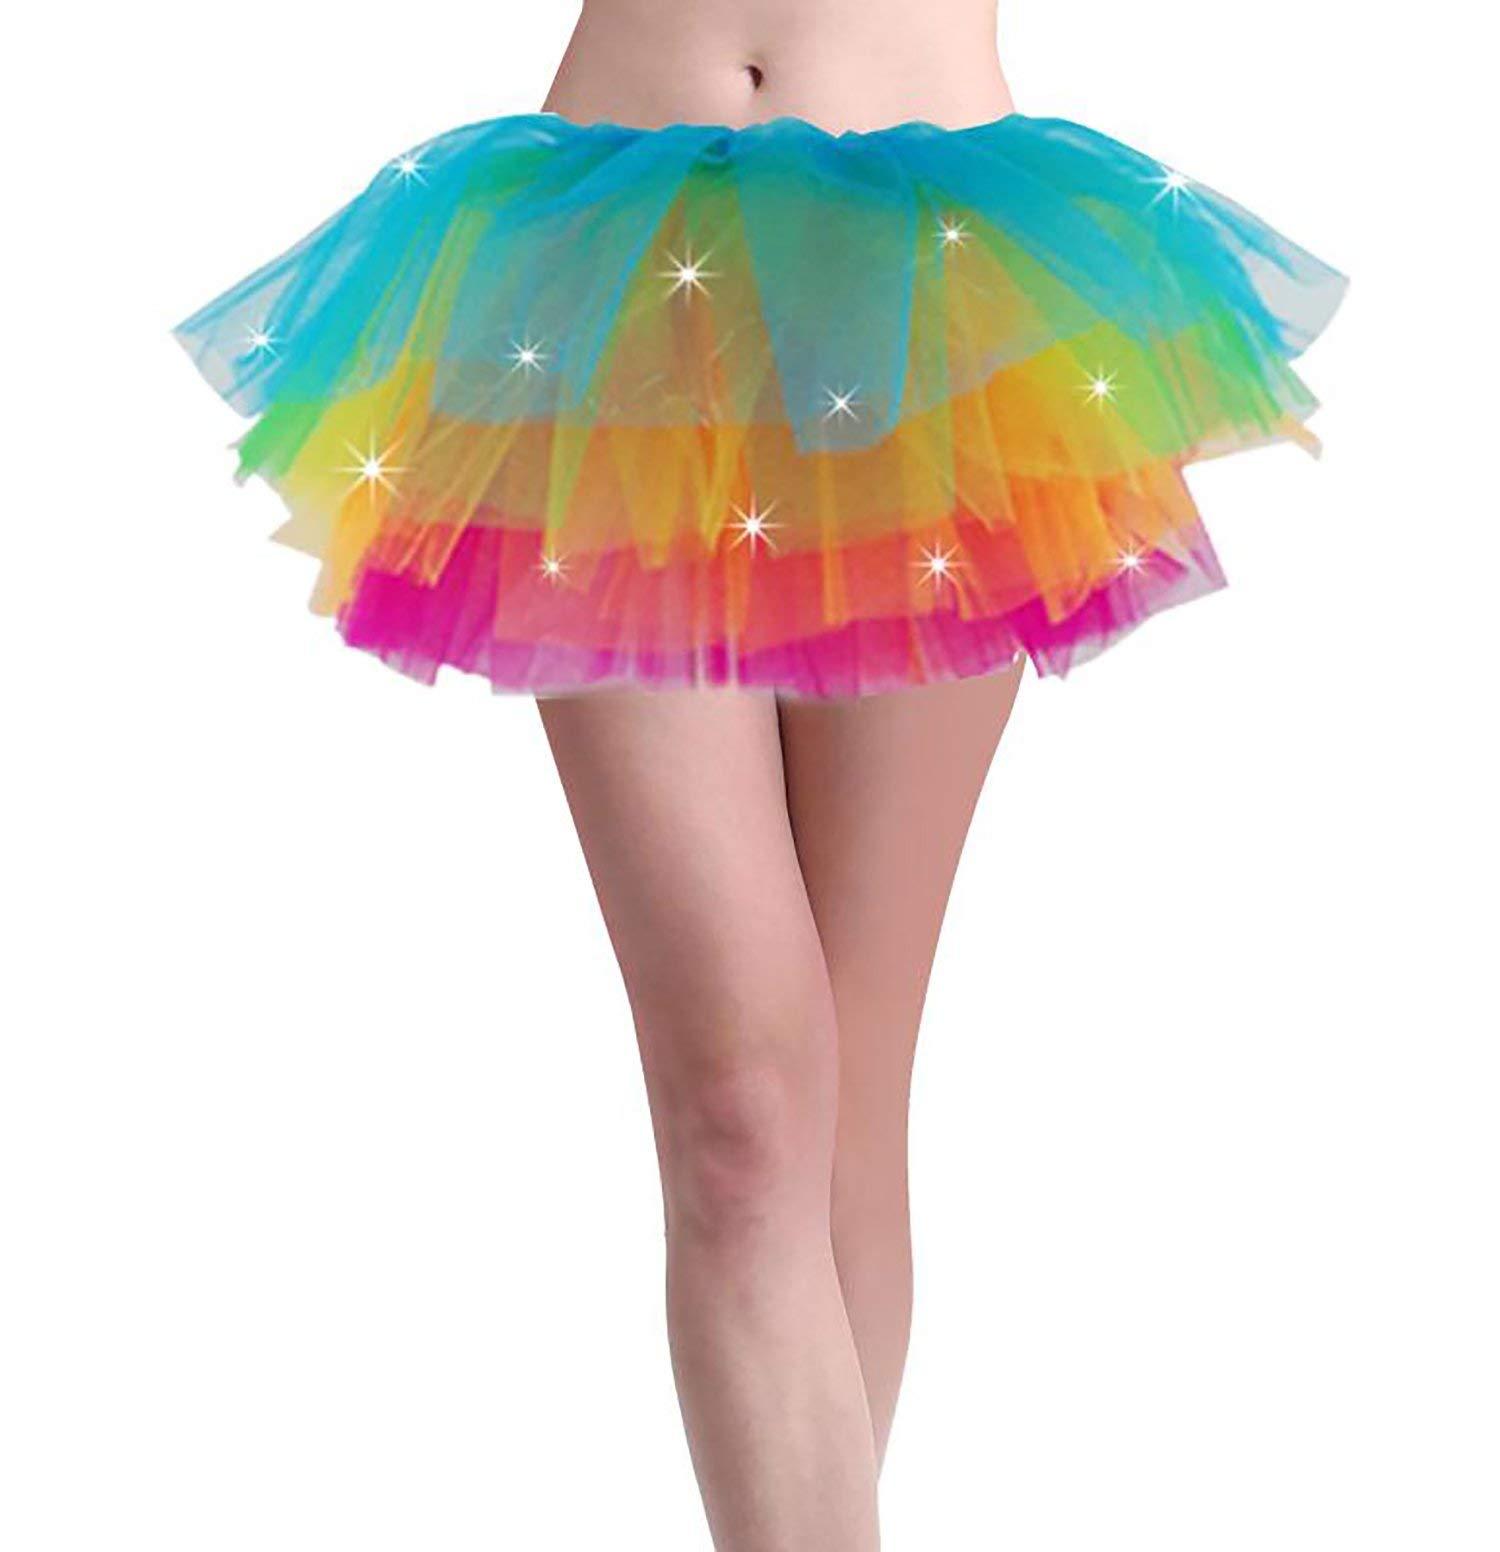 Women Led Light Up Neon Rainbow Party Dance Tutu Skirt